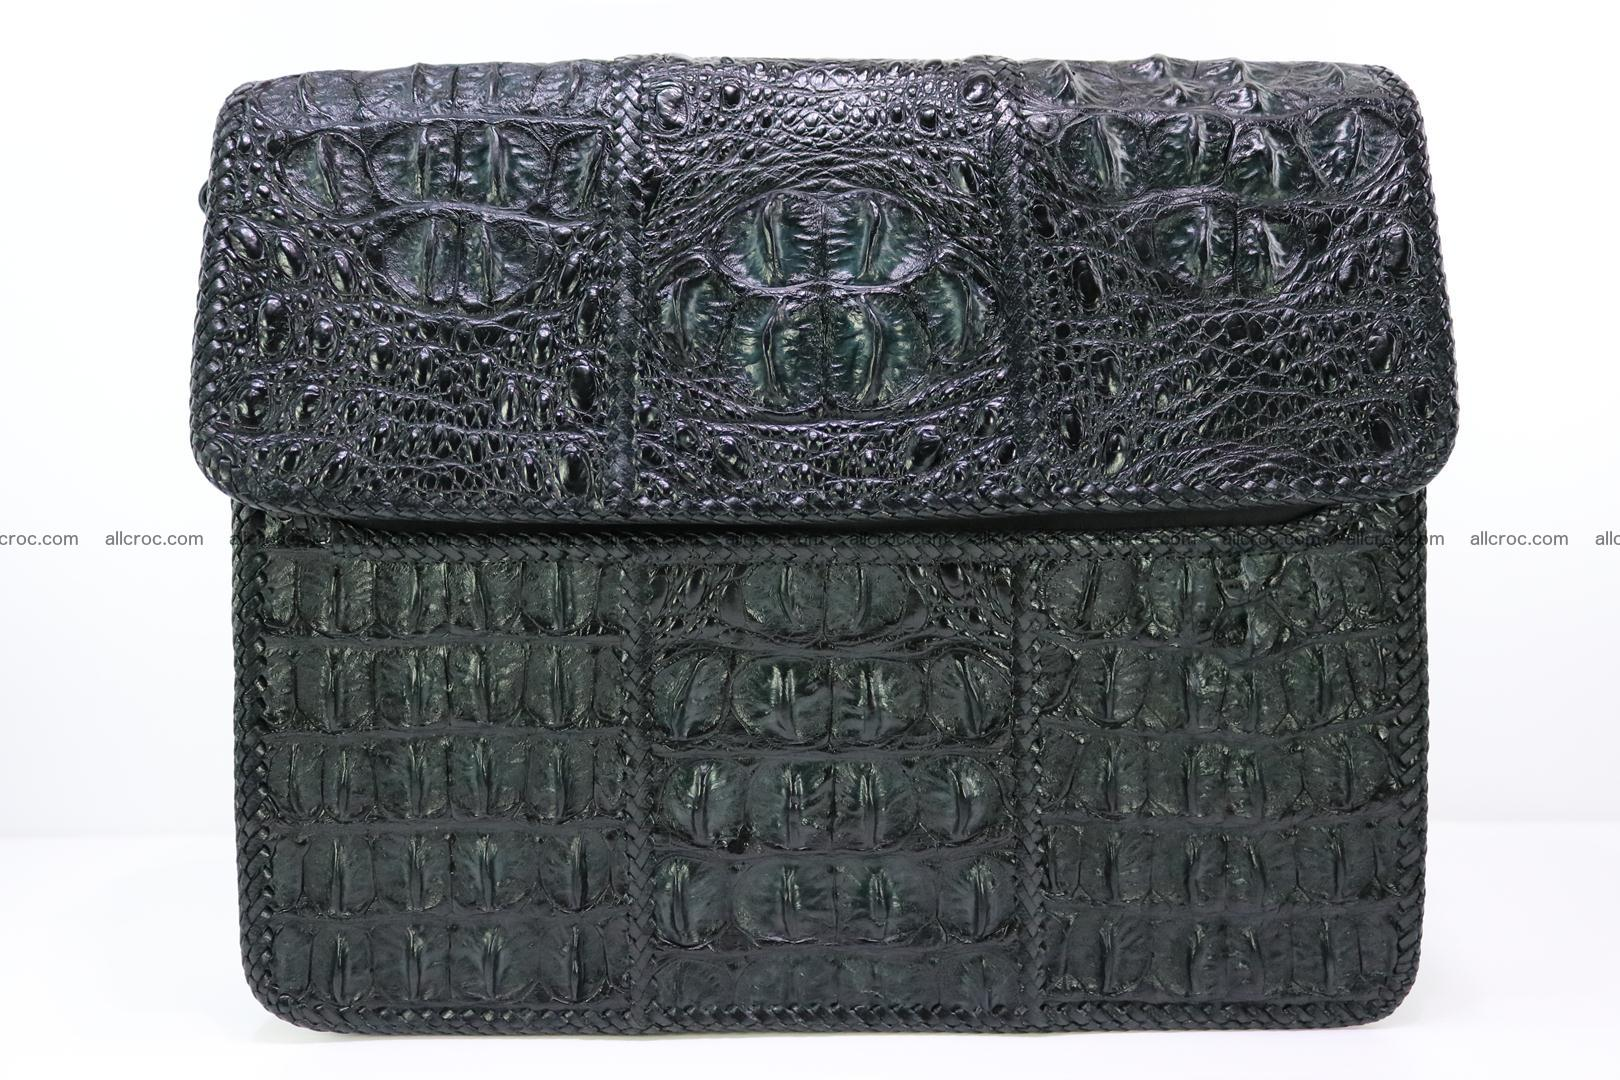 Crocodile skin shoulder bag with braided edges 147 Foto 0